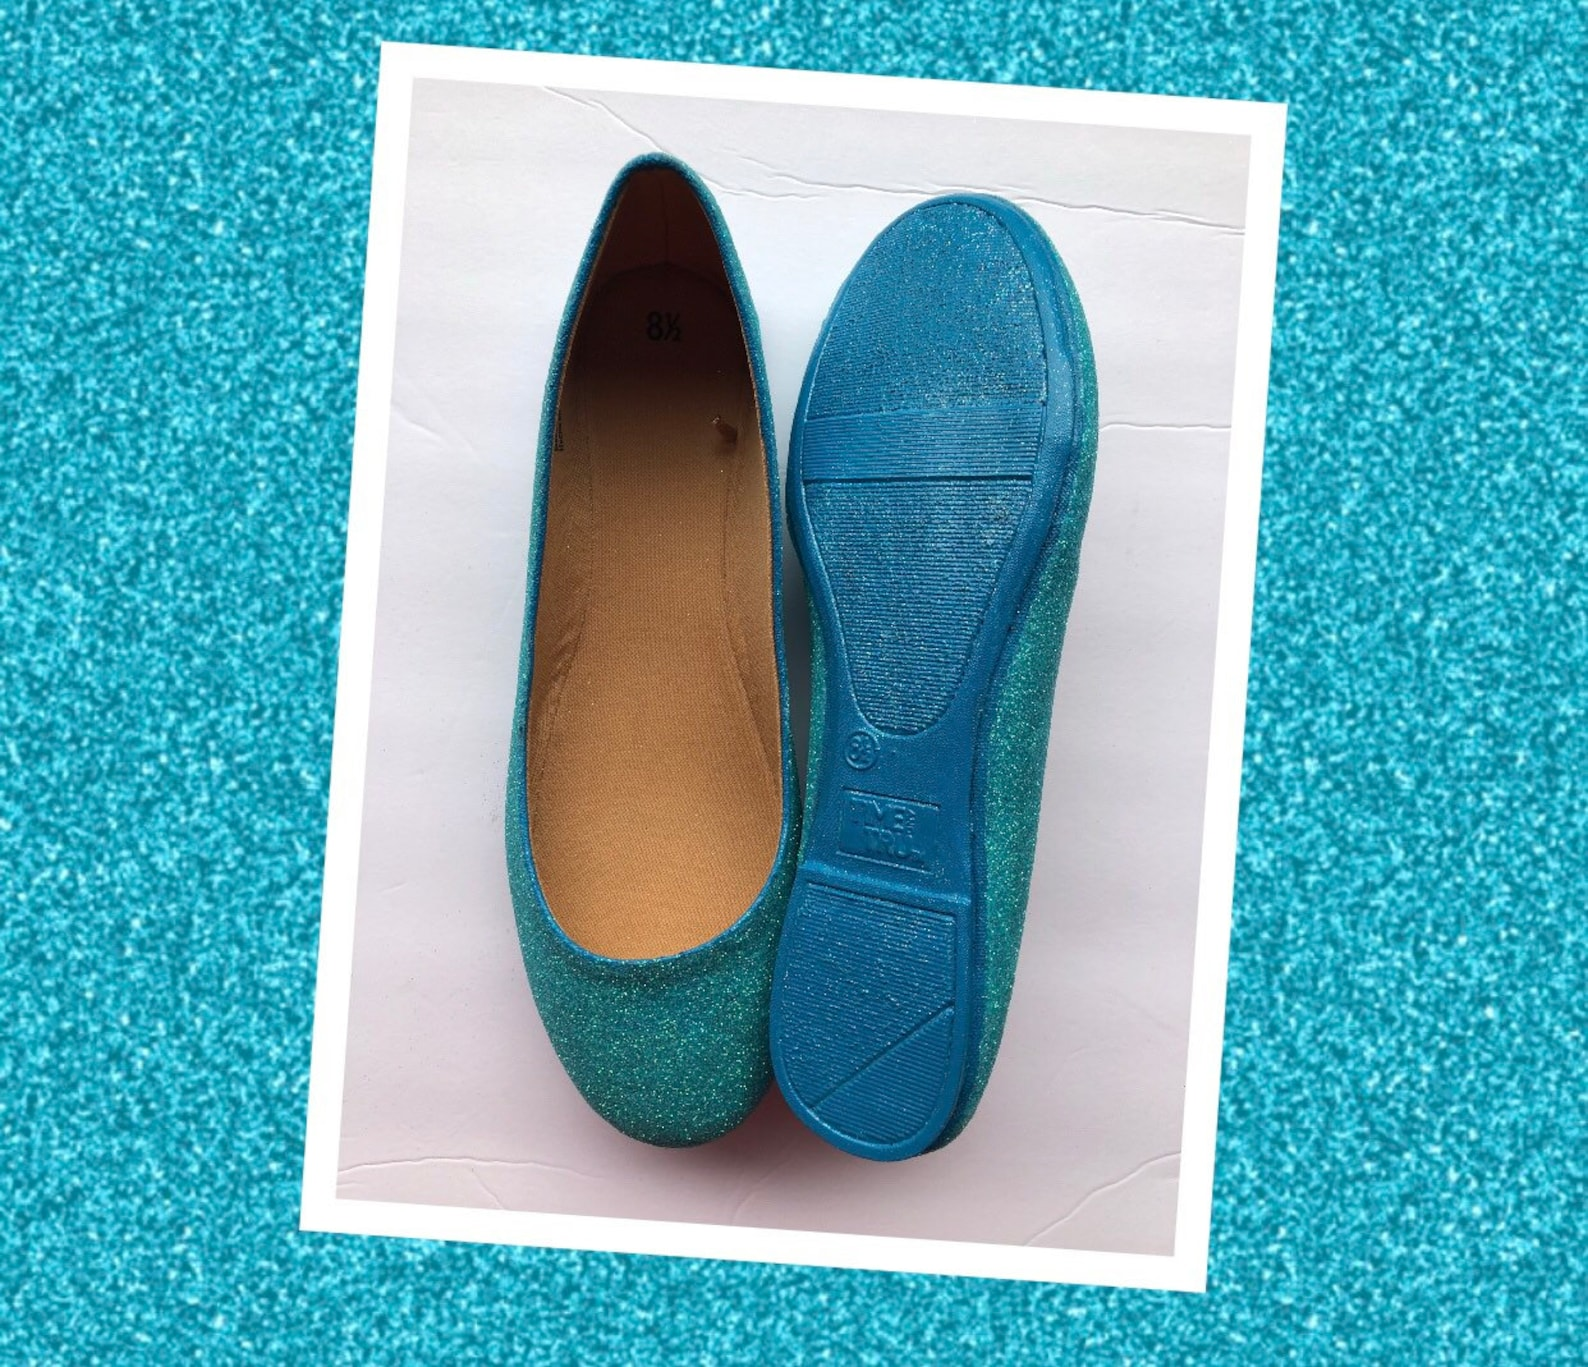 blue flats custom women's blue turquoise glittered ballet flats w/blue shimmer bottoms *free u.s. shipping* jco.customs by k